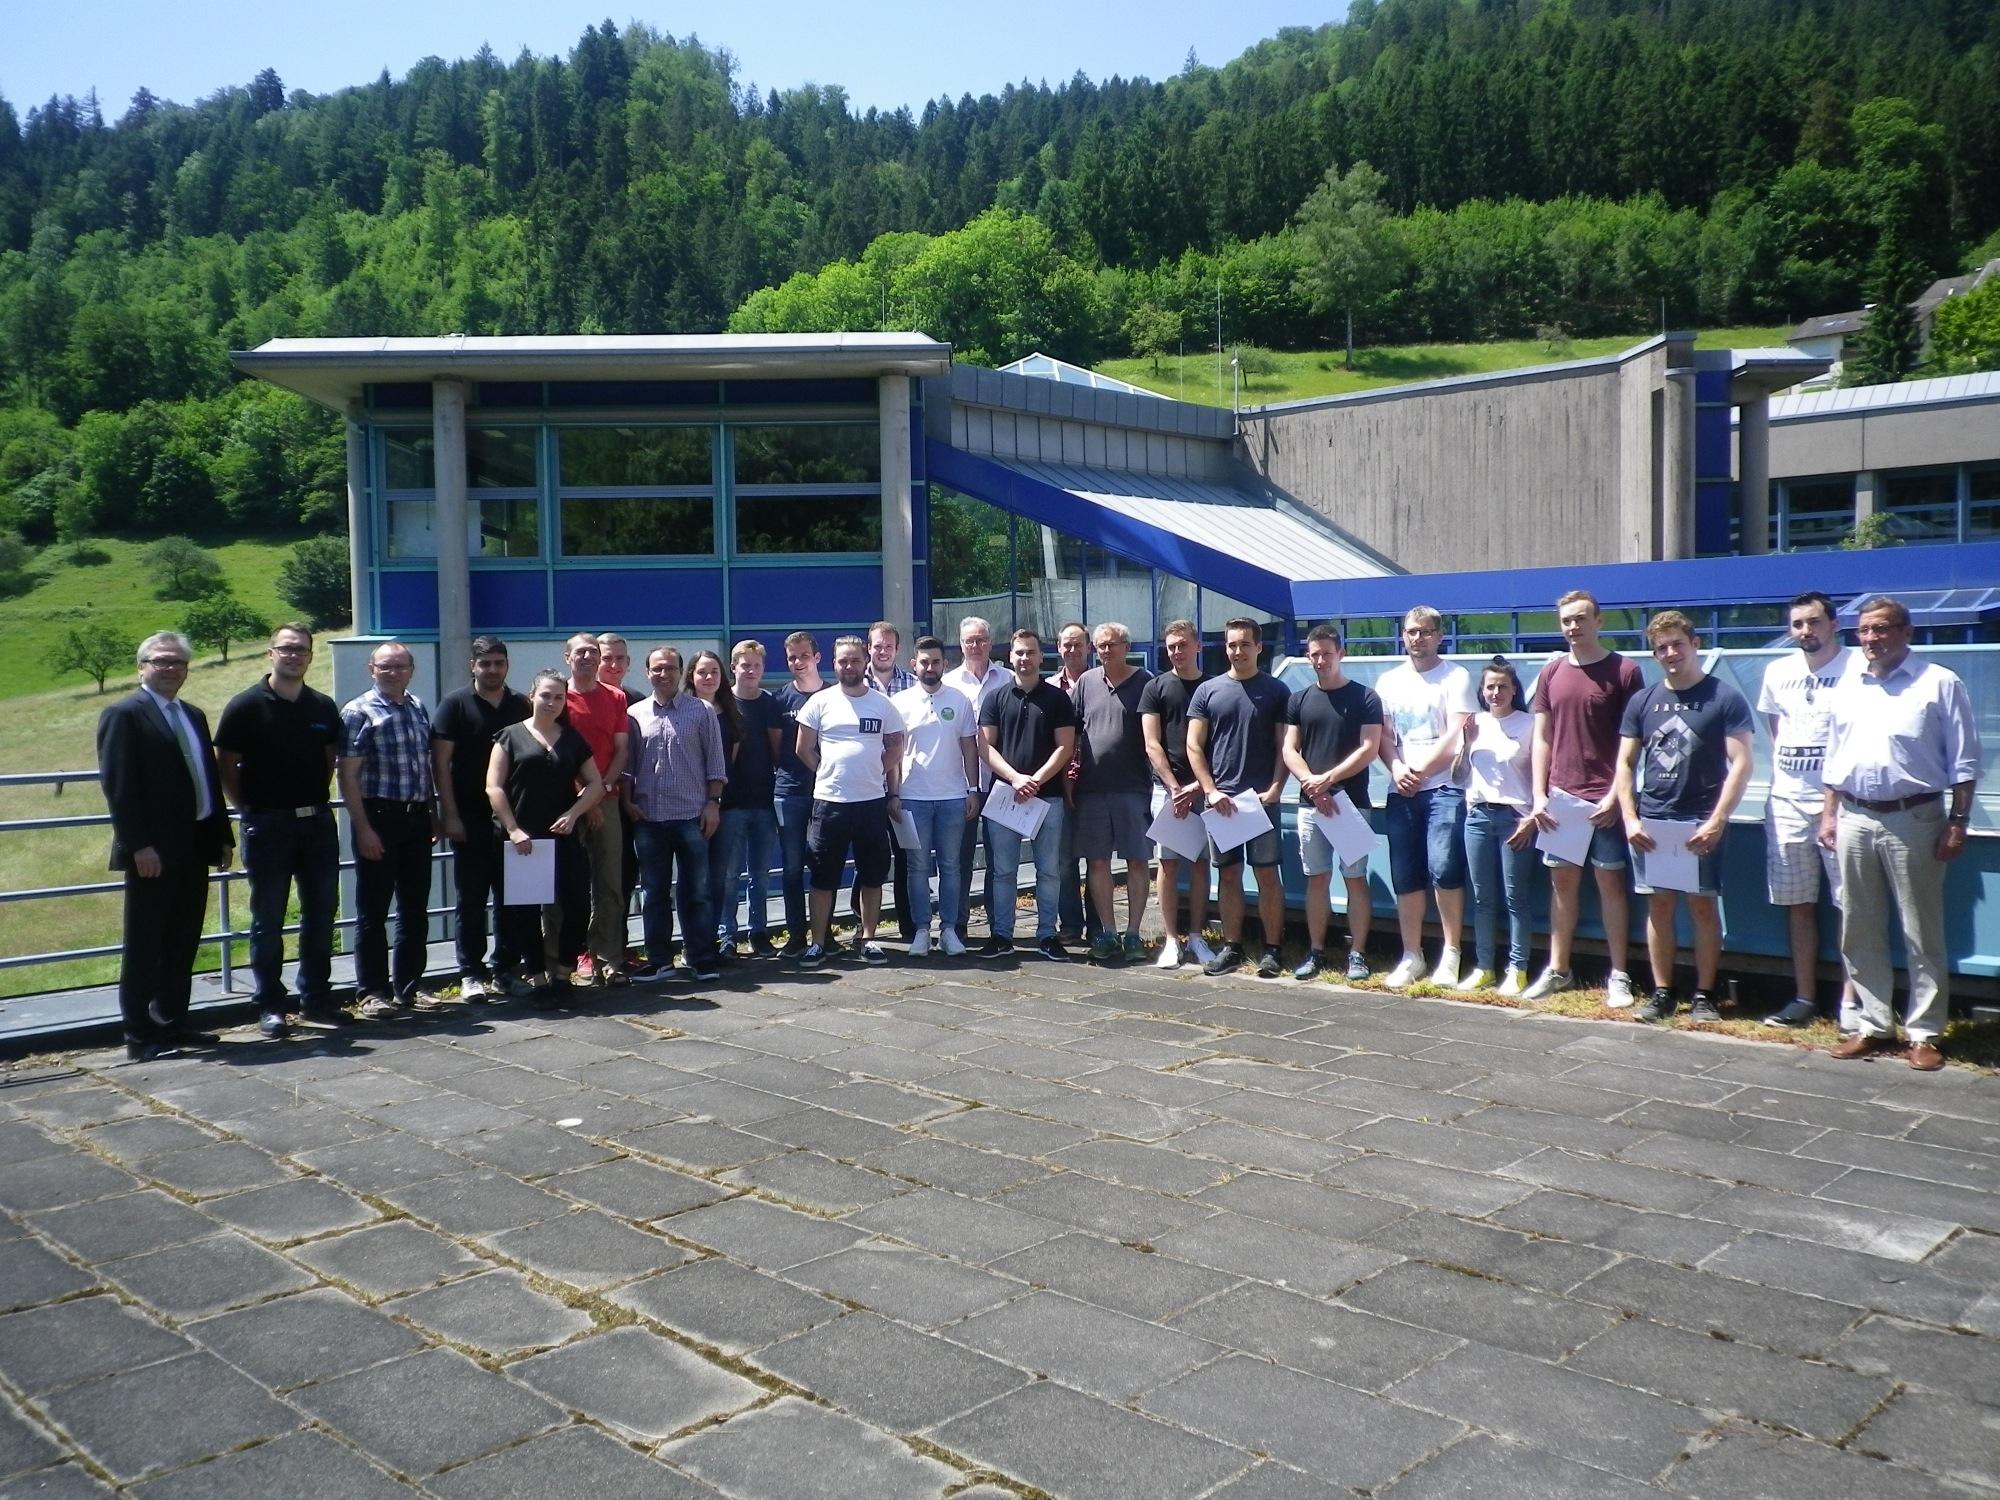 2019-6-26-WOL-Alexander Haas-BS Absolventen06 2019 Berufsschule IMGP0027